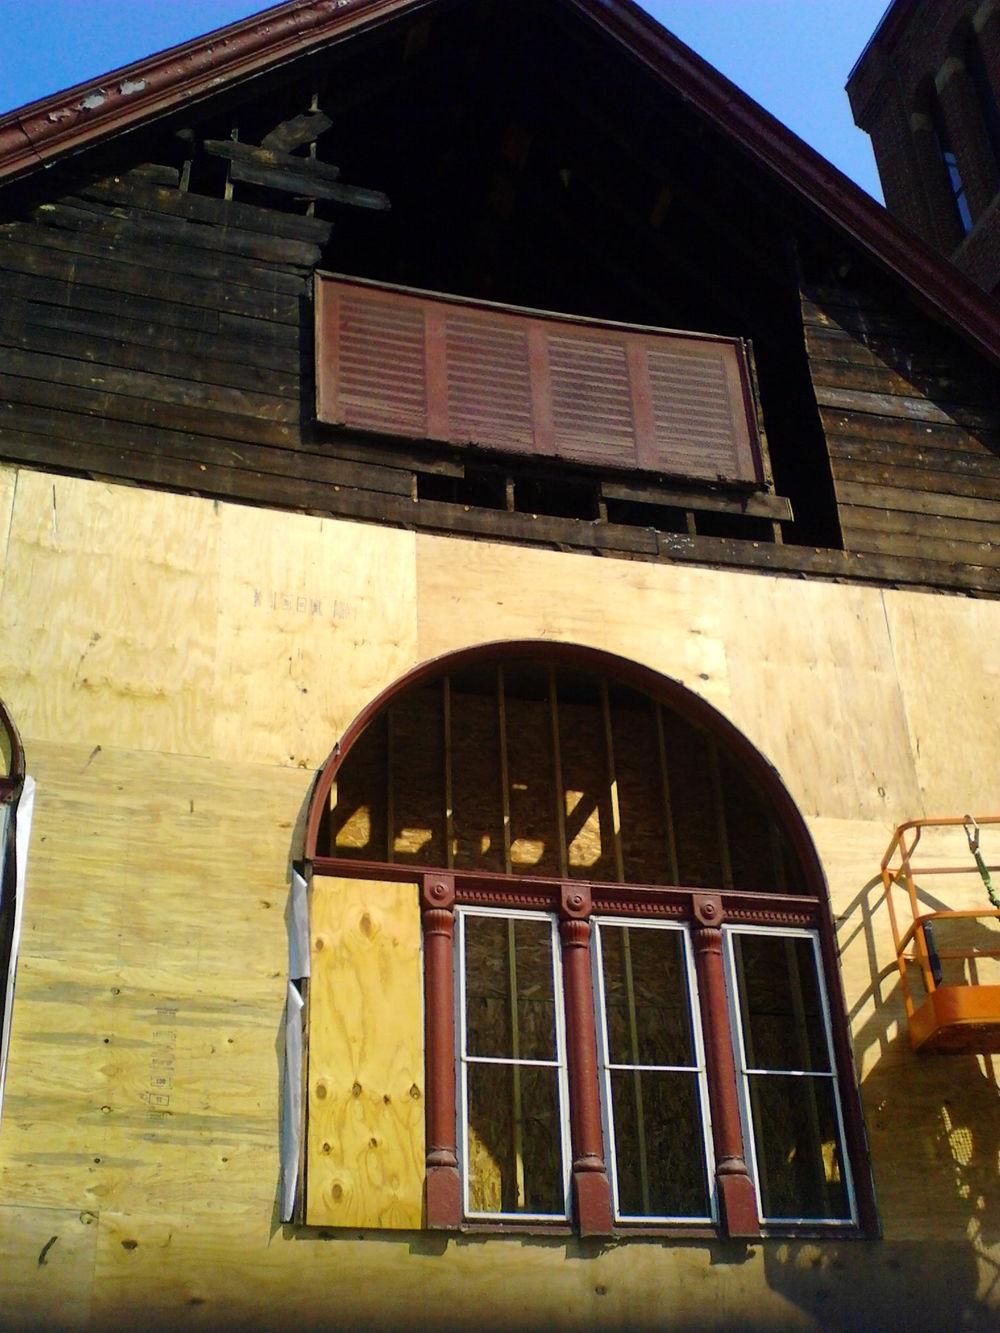 Work progressing on the sanctuary (exterior view).